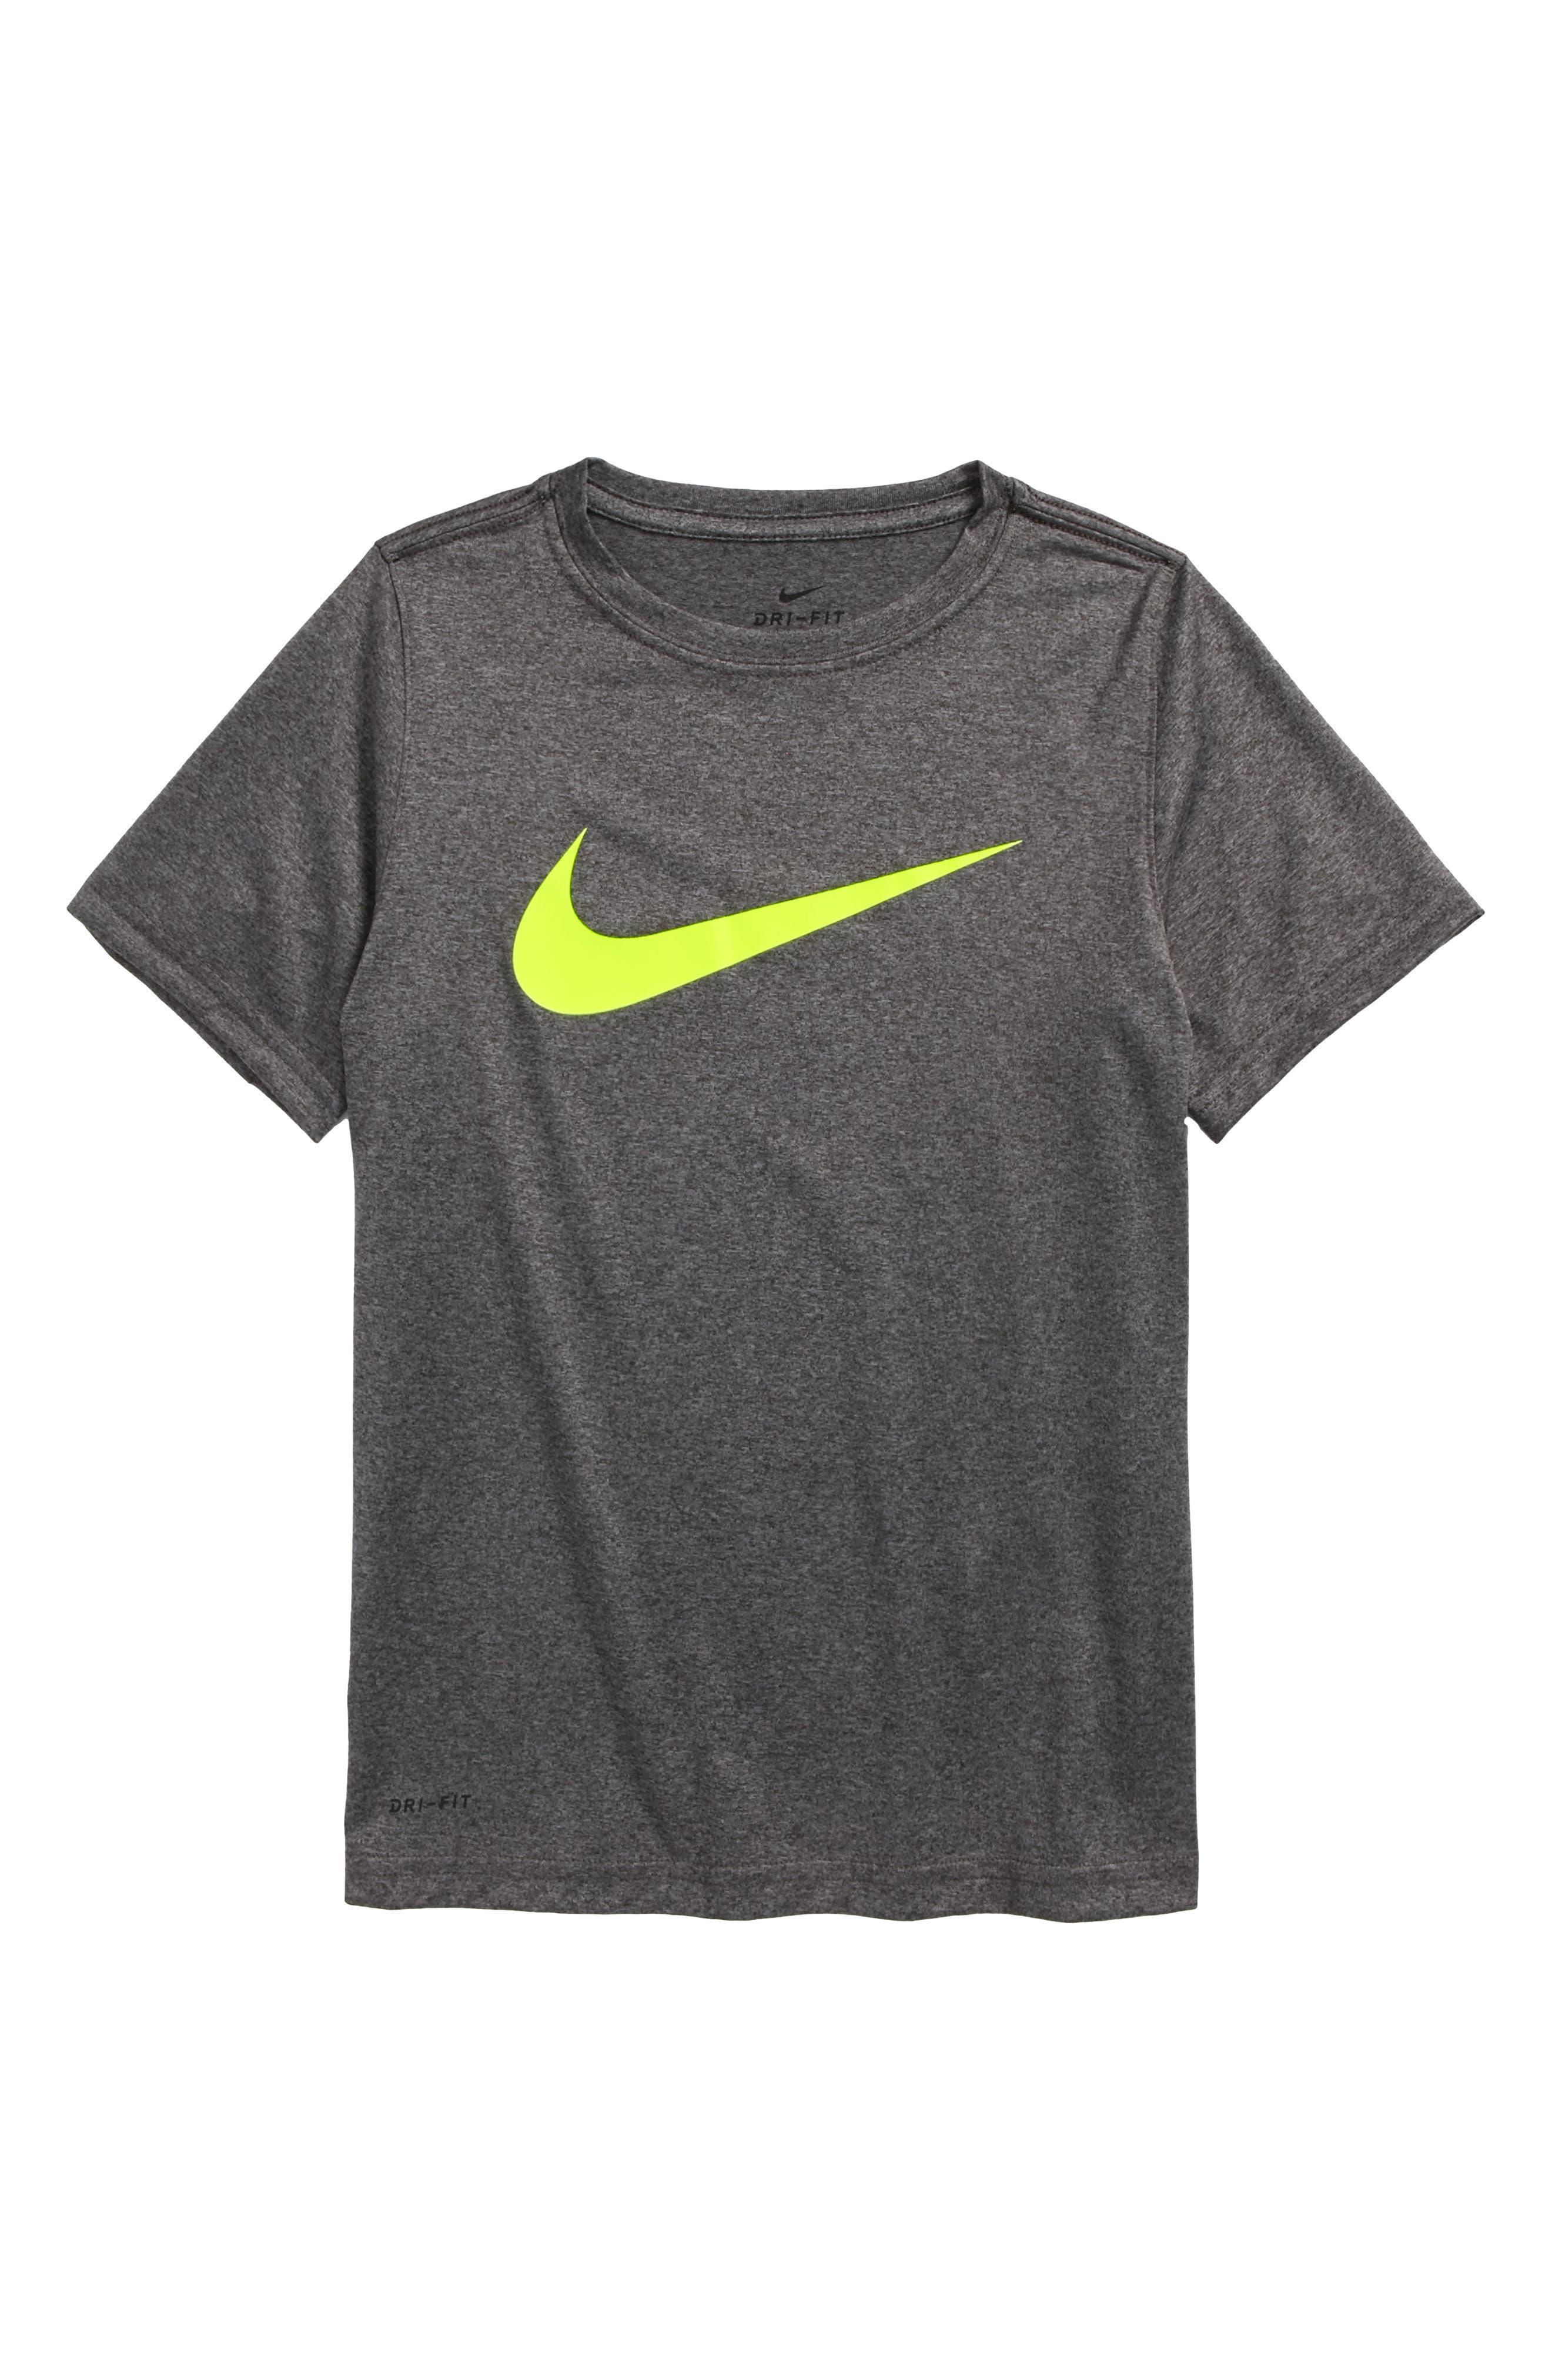 Alternate Image 1 Selected - Nike Dry Swoosh T-Shirt (Little Boys & Big Boys)